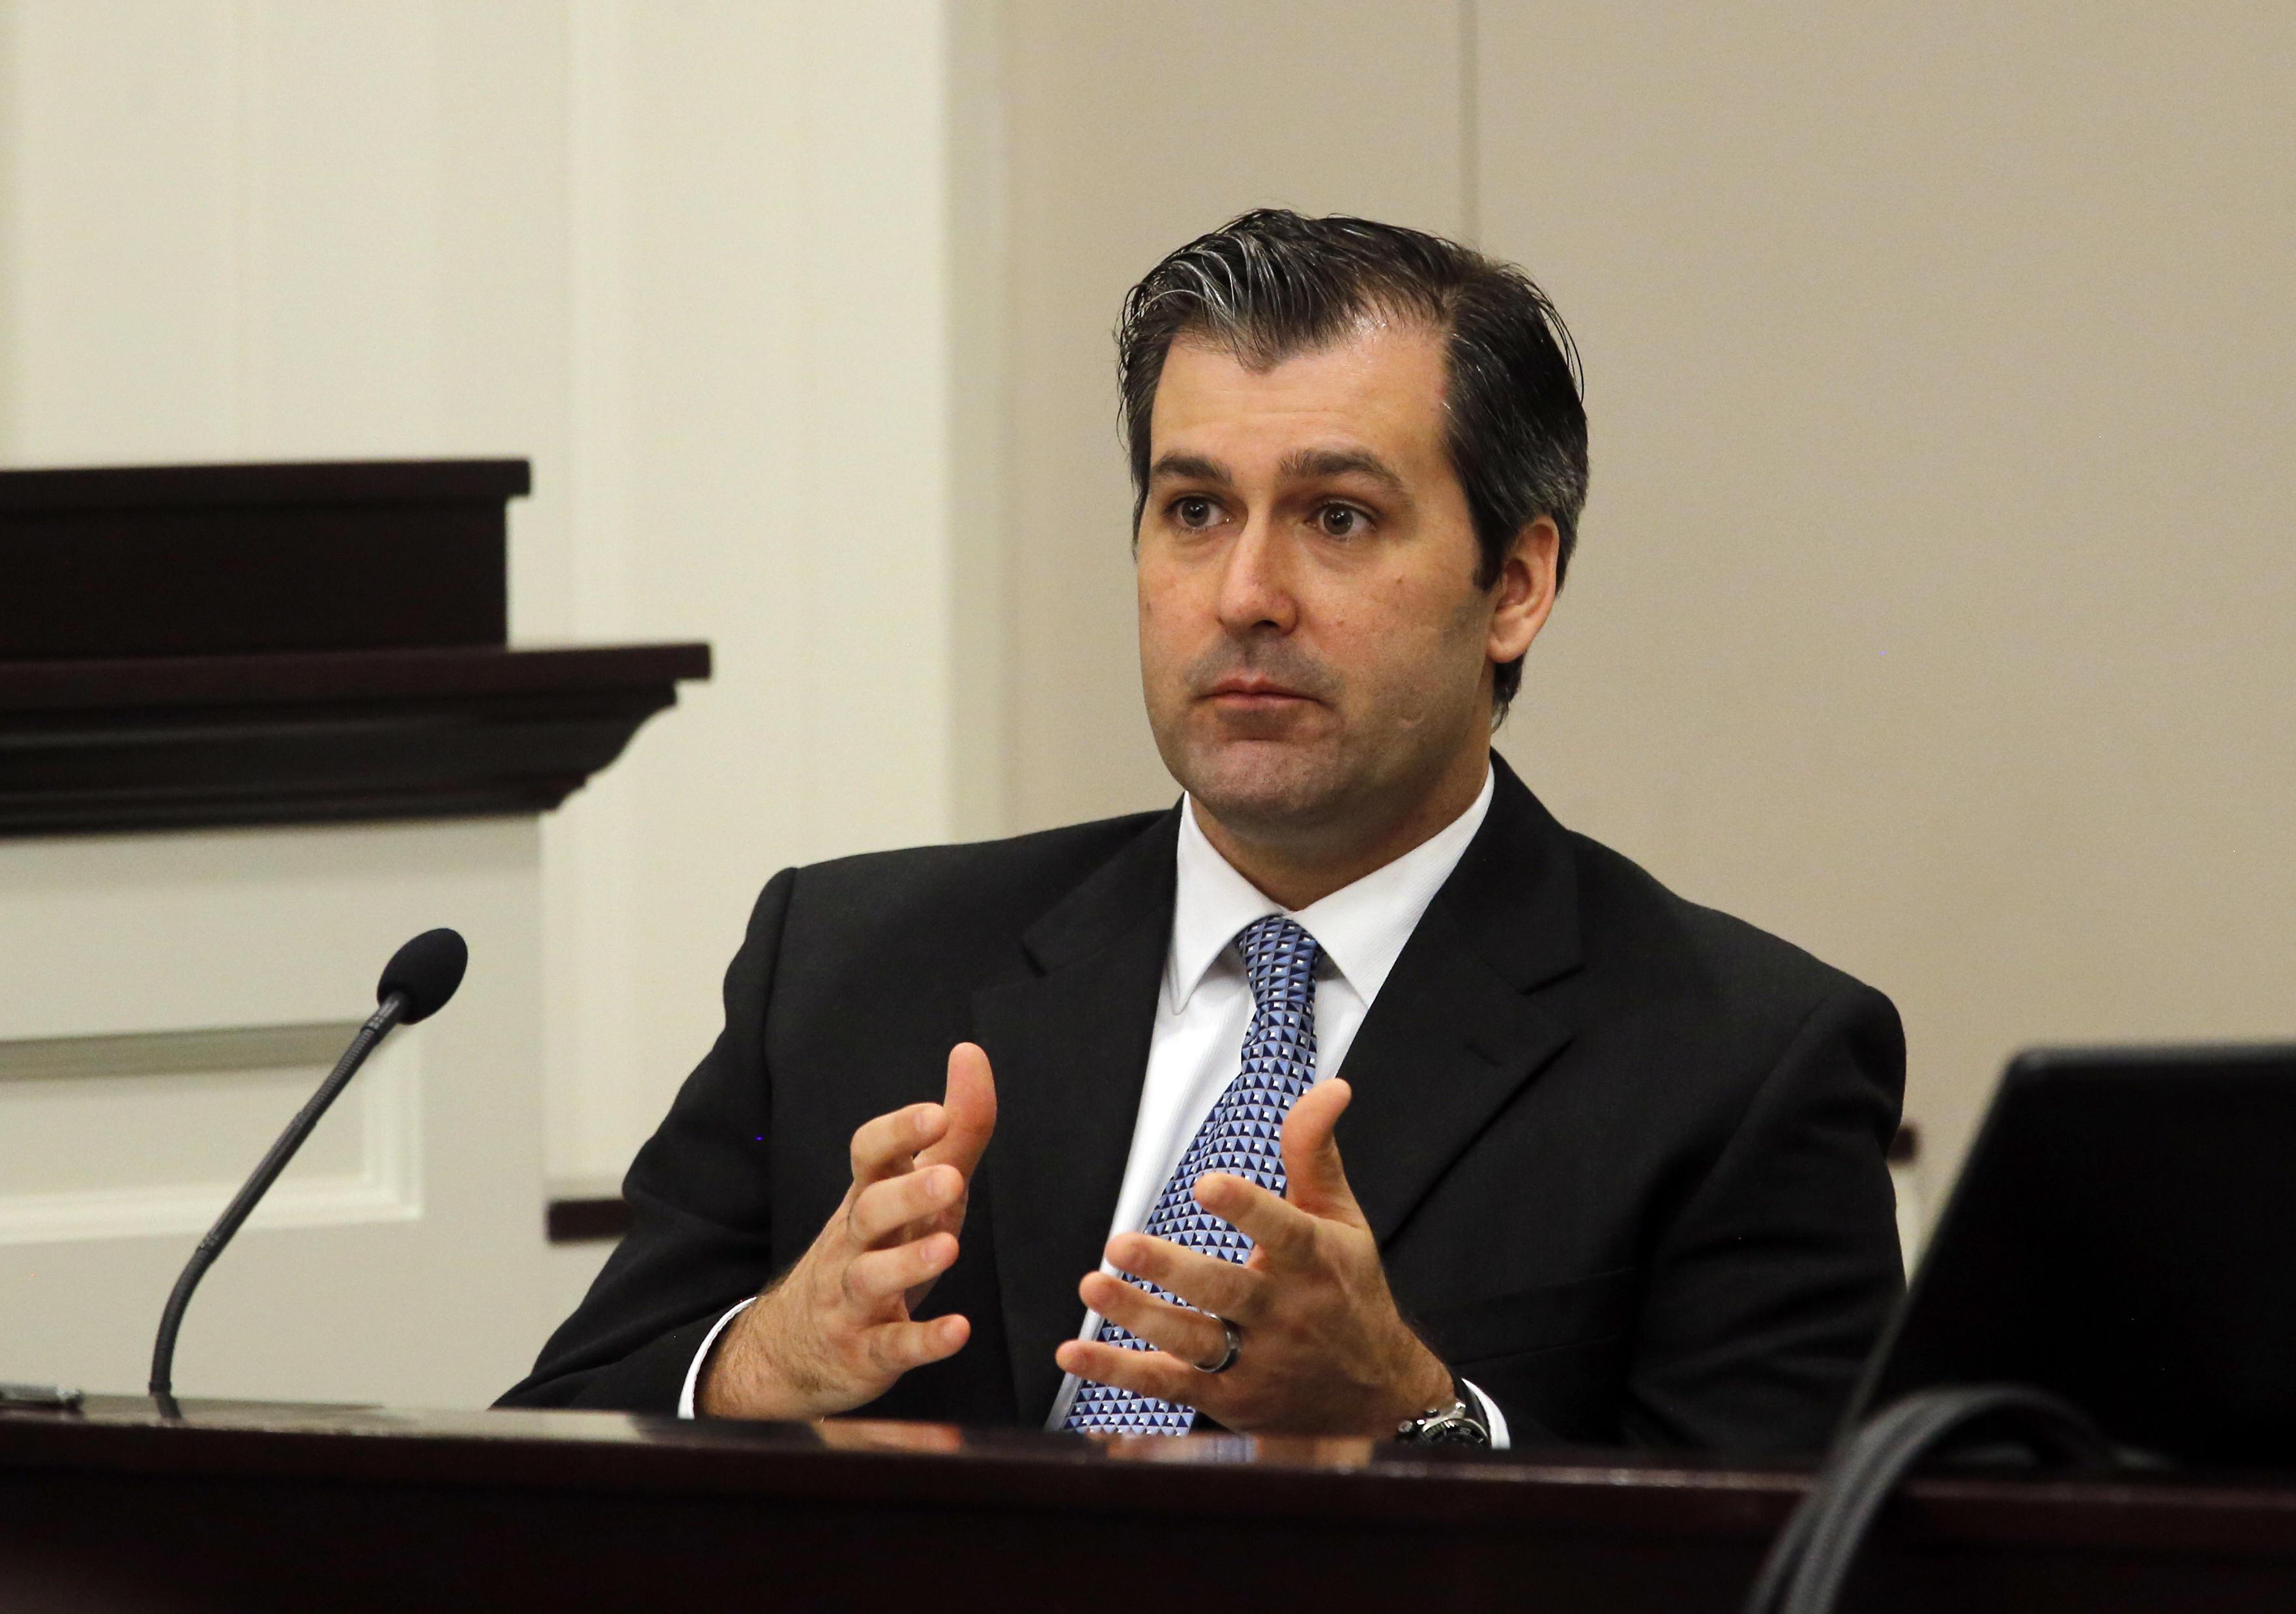 michael slager trial jury foreman dorsey montgomery says 5 jurors